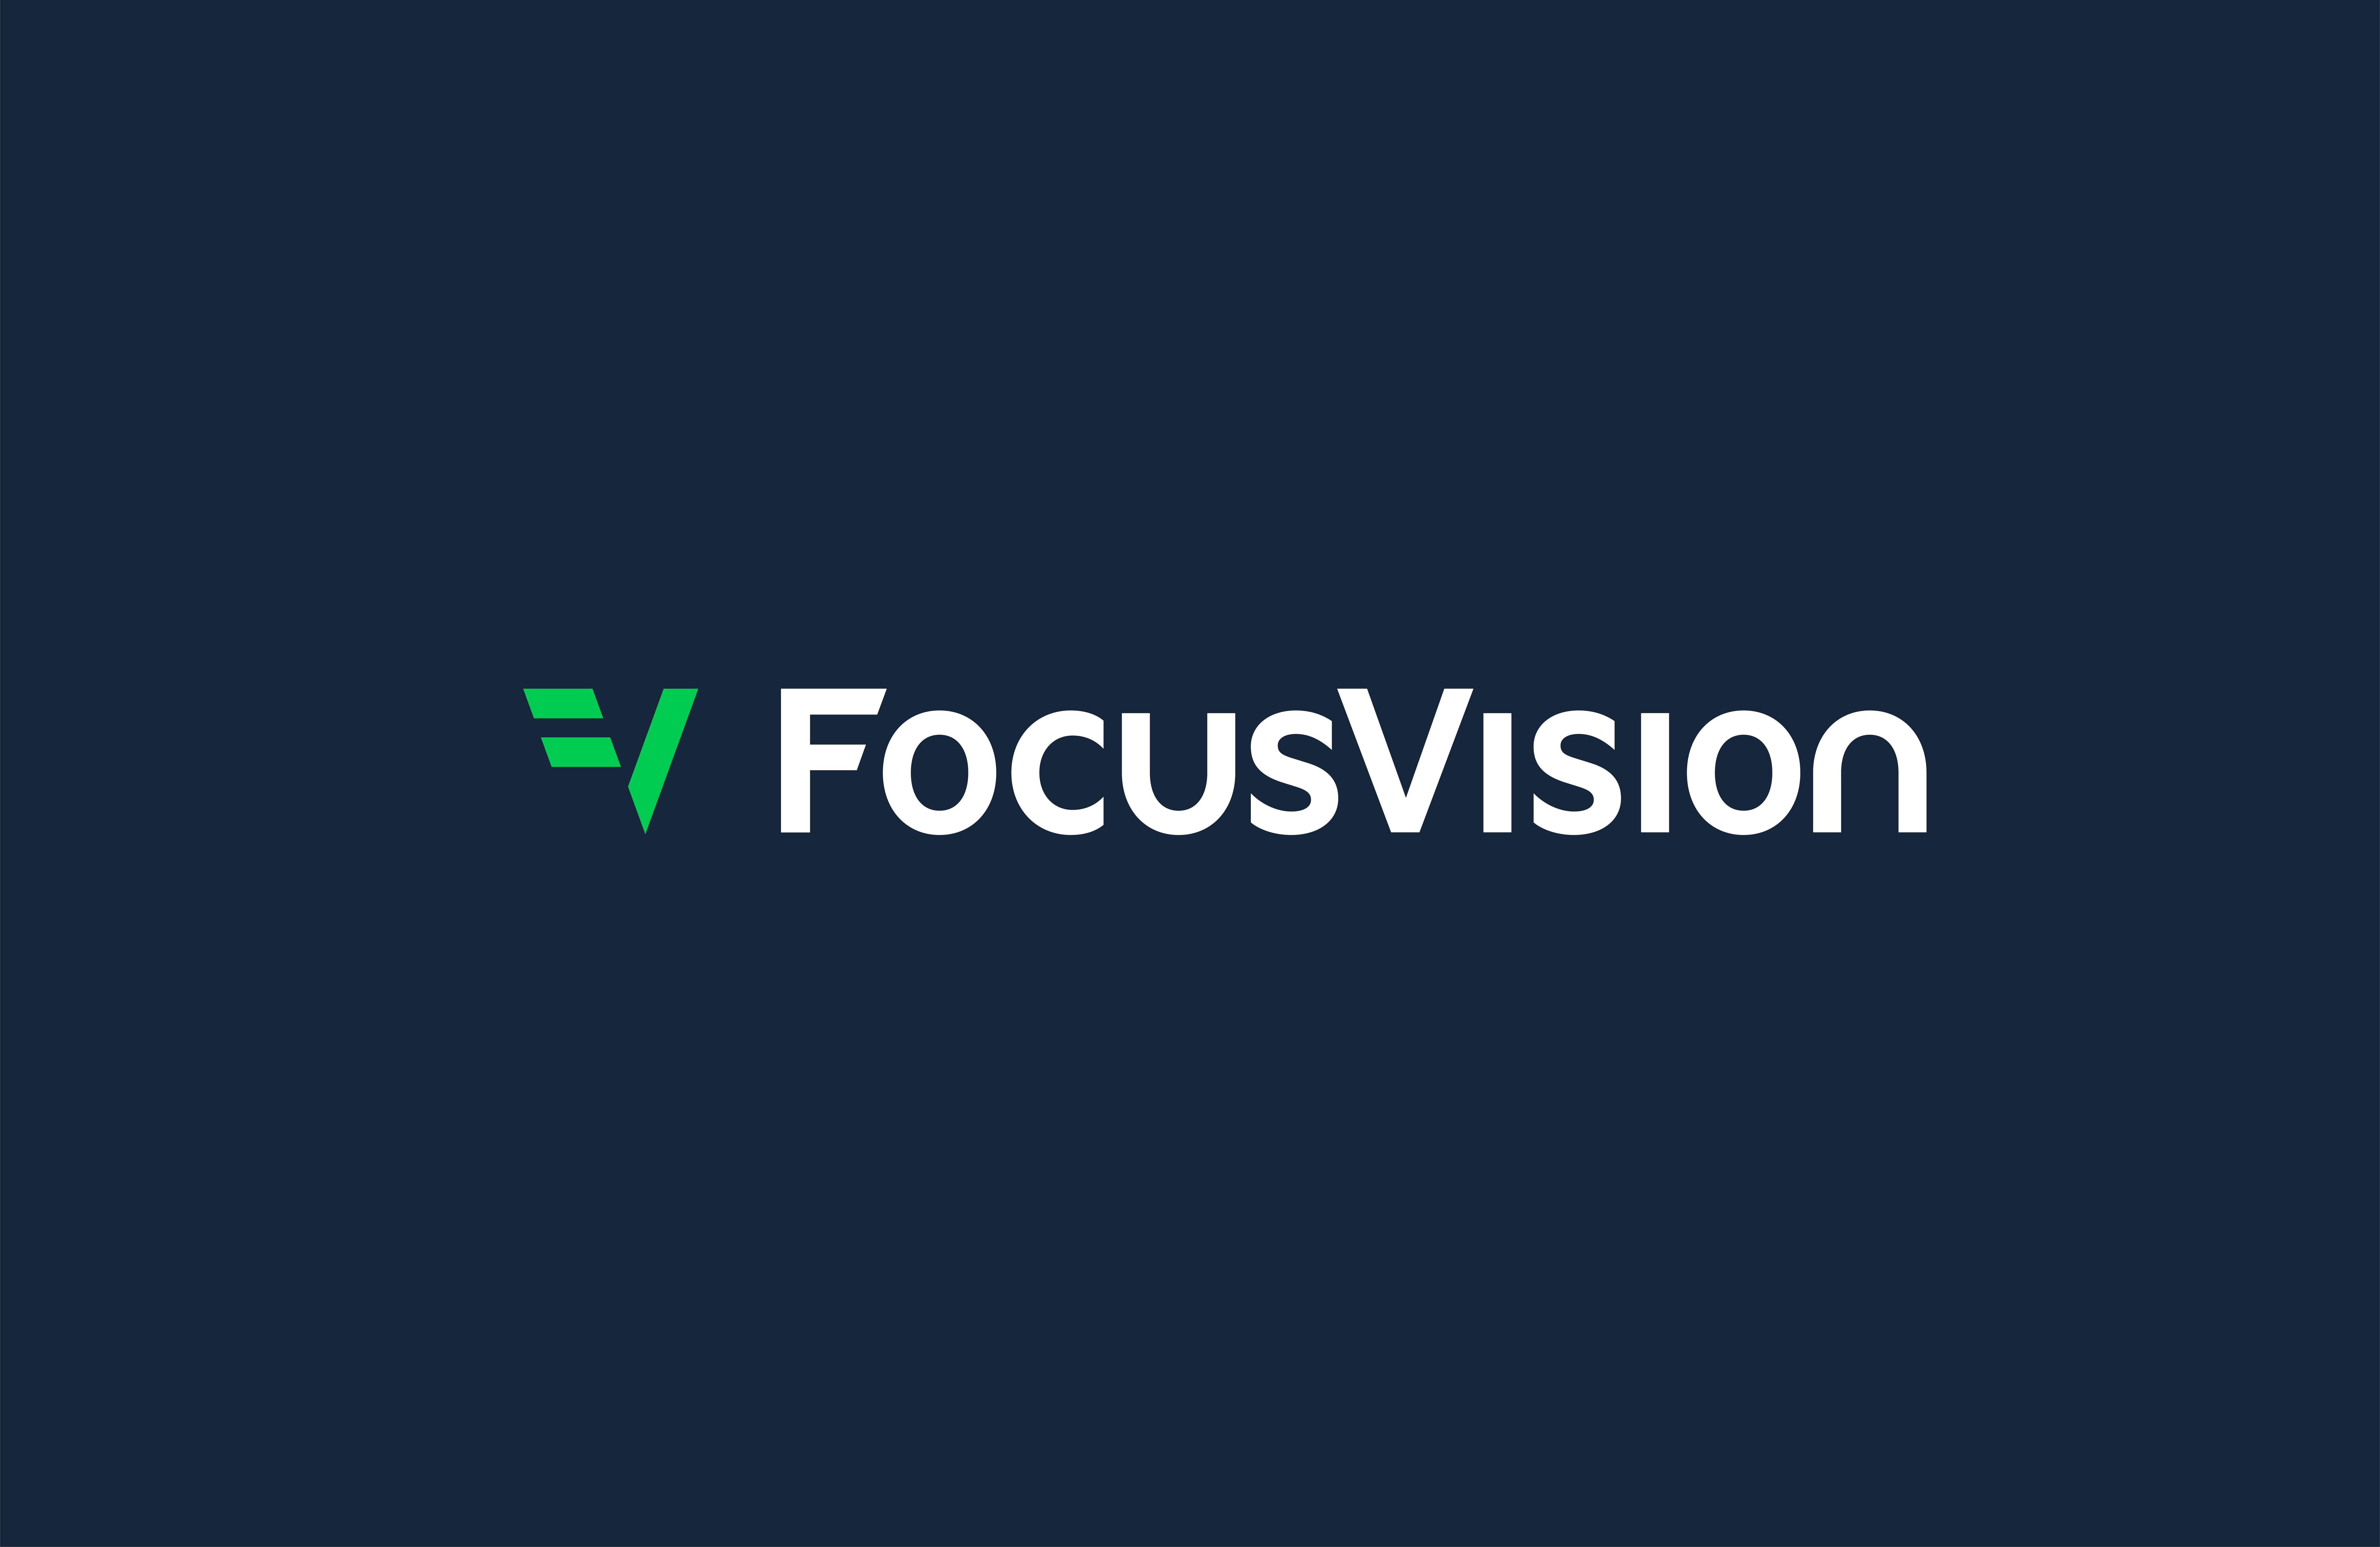 Cover image: FocusVision